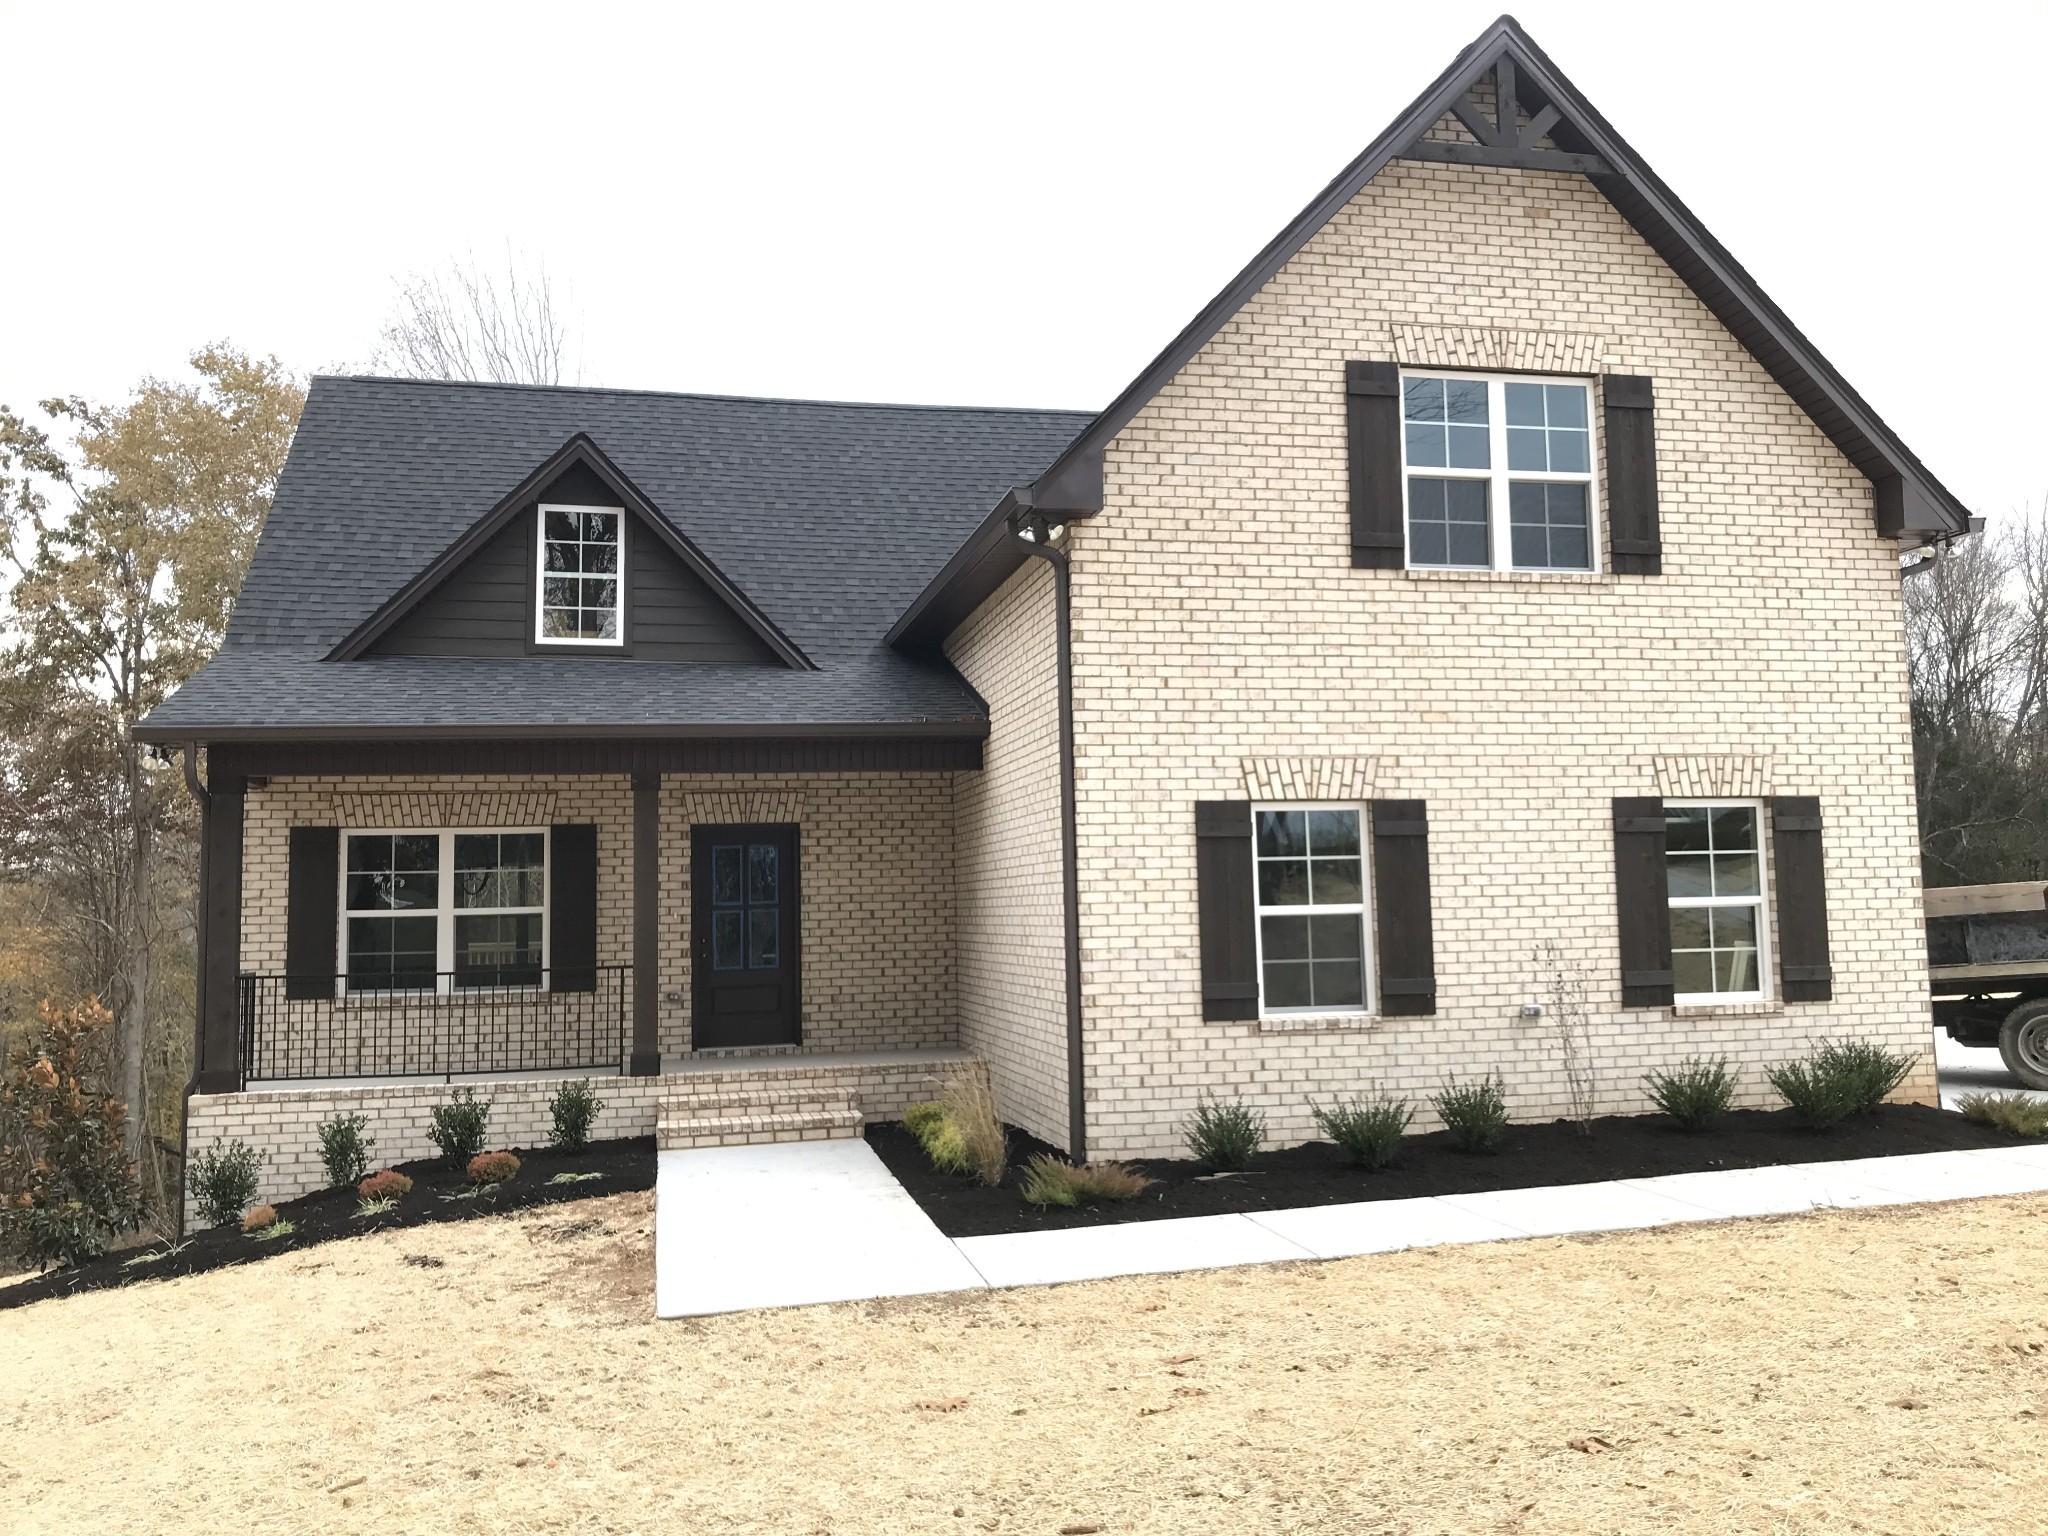 9663 Cross Plains Rd, White House, TN 37188 - White House, TN real estate listing